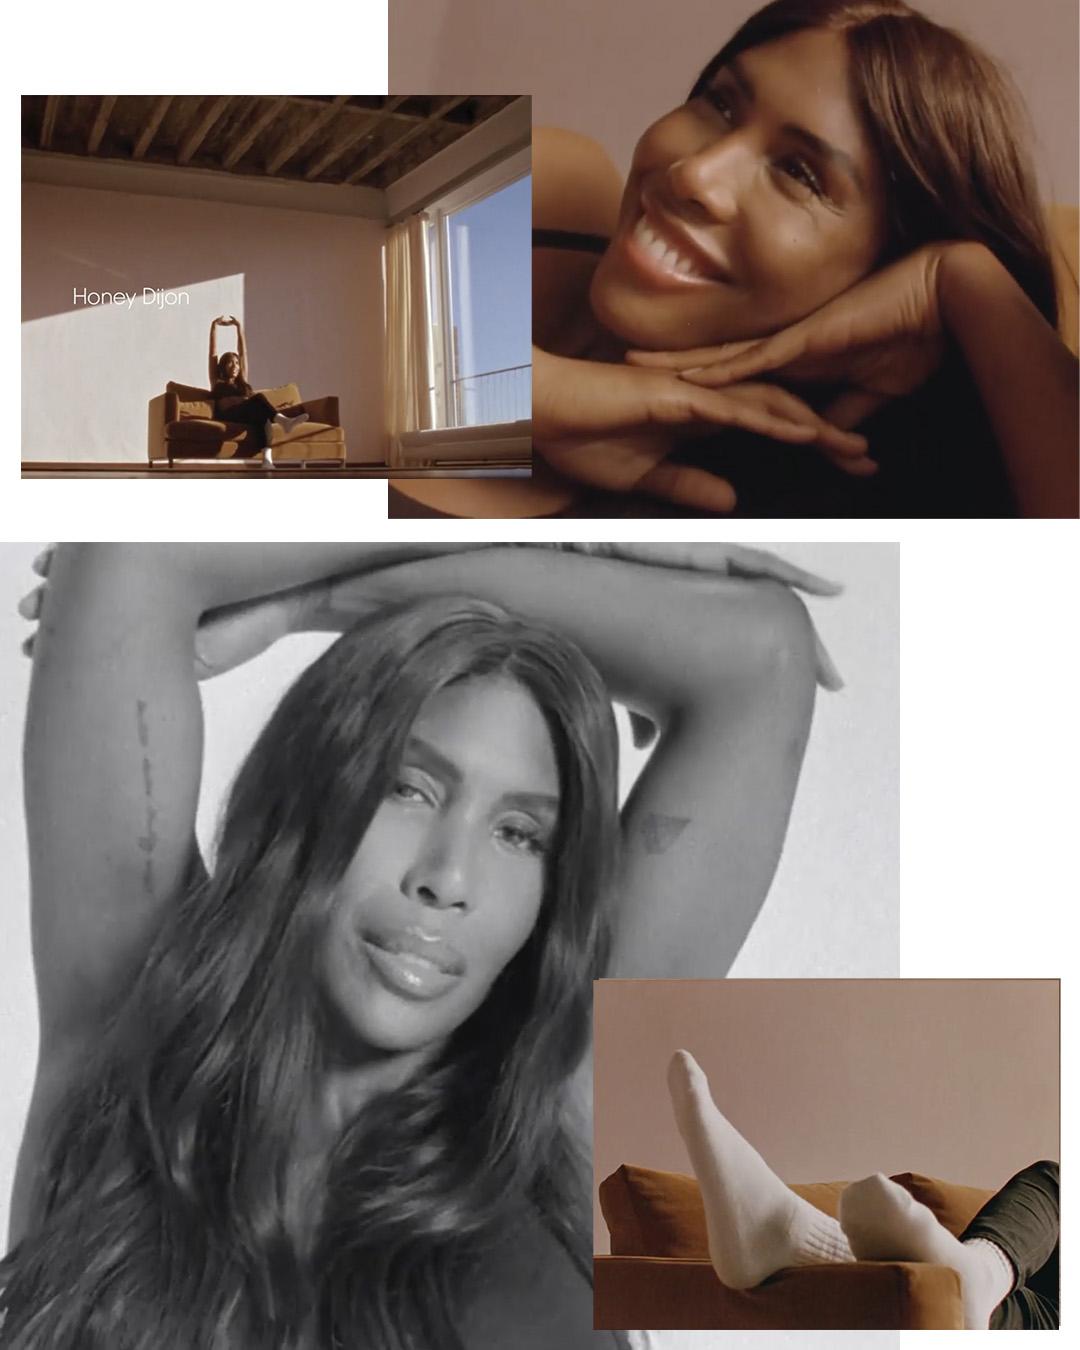 DJ Honey Dijon for Calvin Klein 2021 Pride Campaign photographed by raw studios. by Matt Lambert